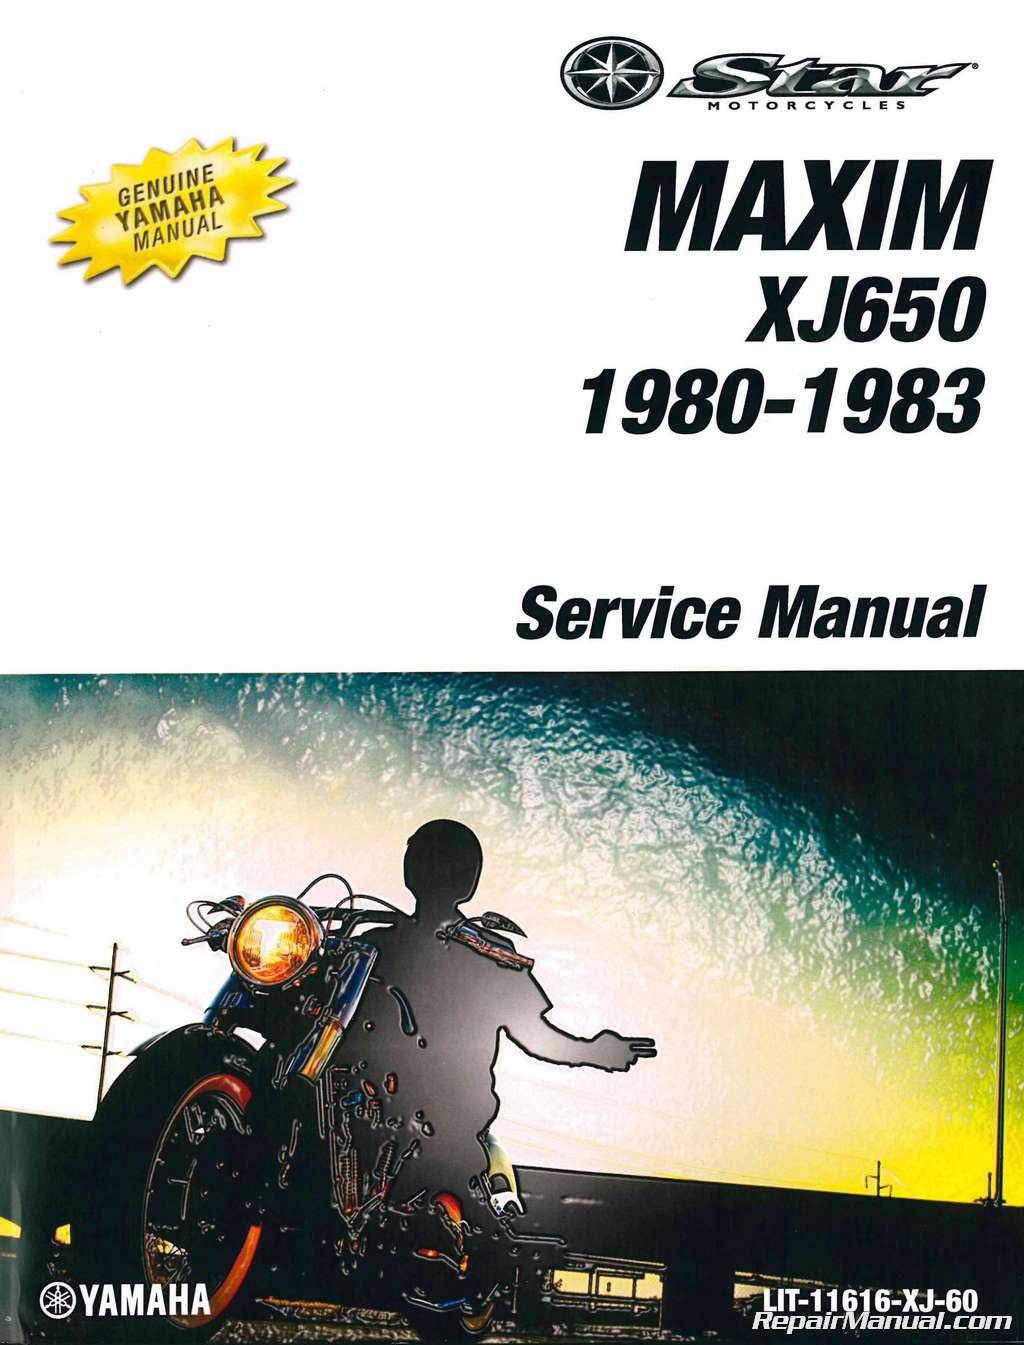 1982 yamaha maxim 650 service manual pdf